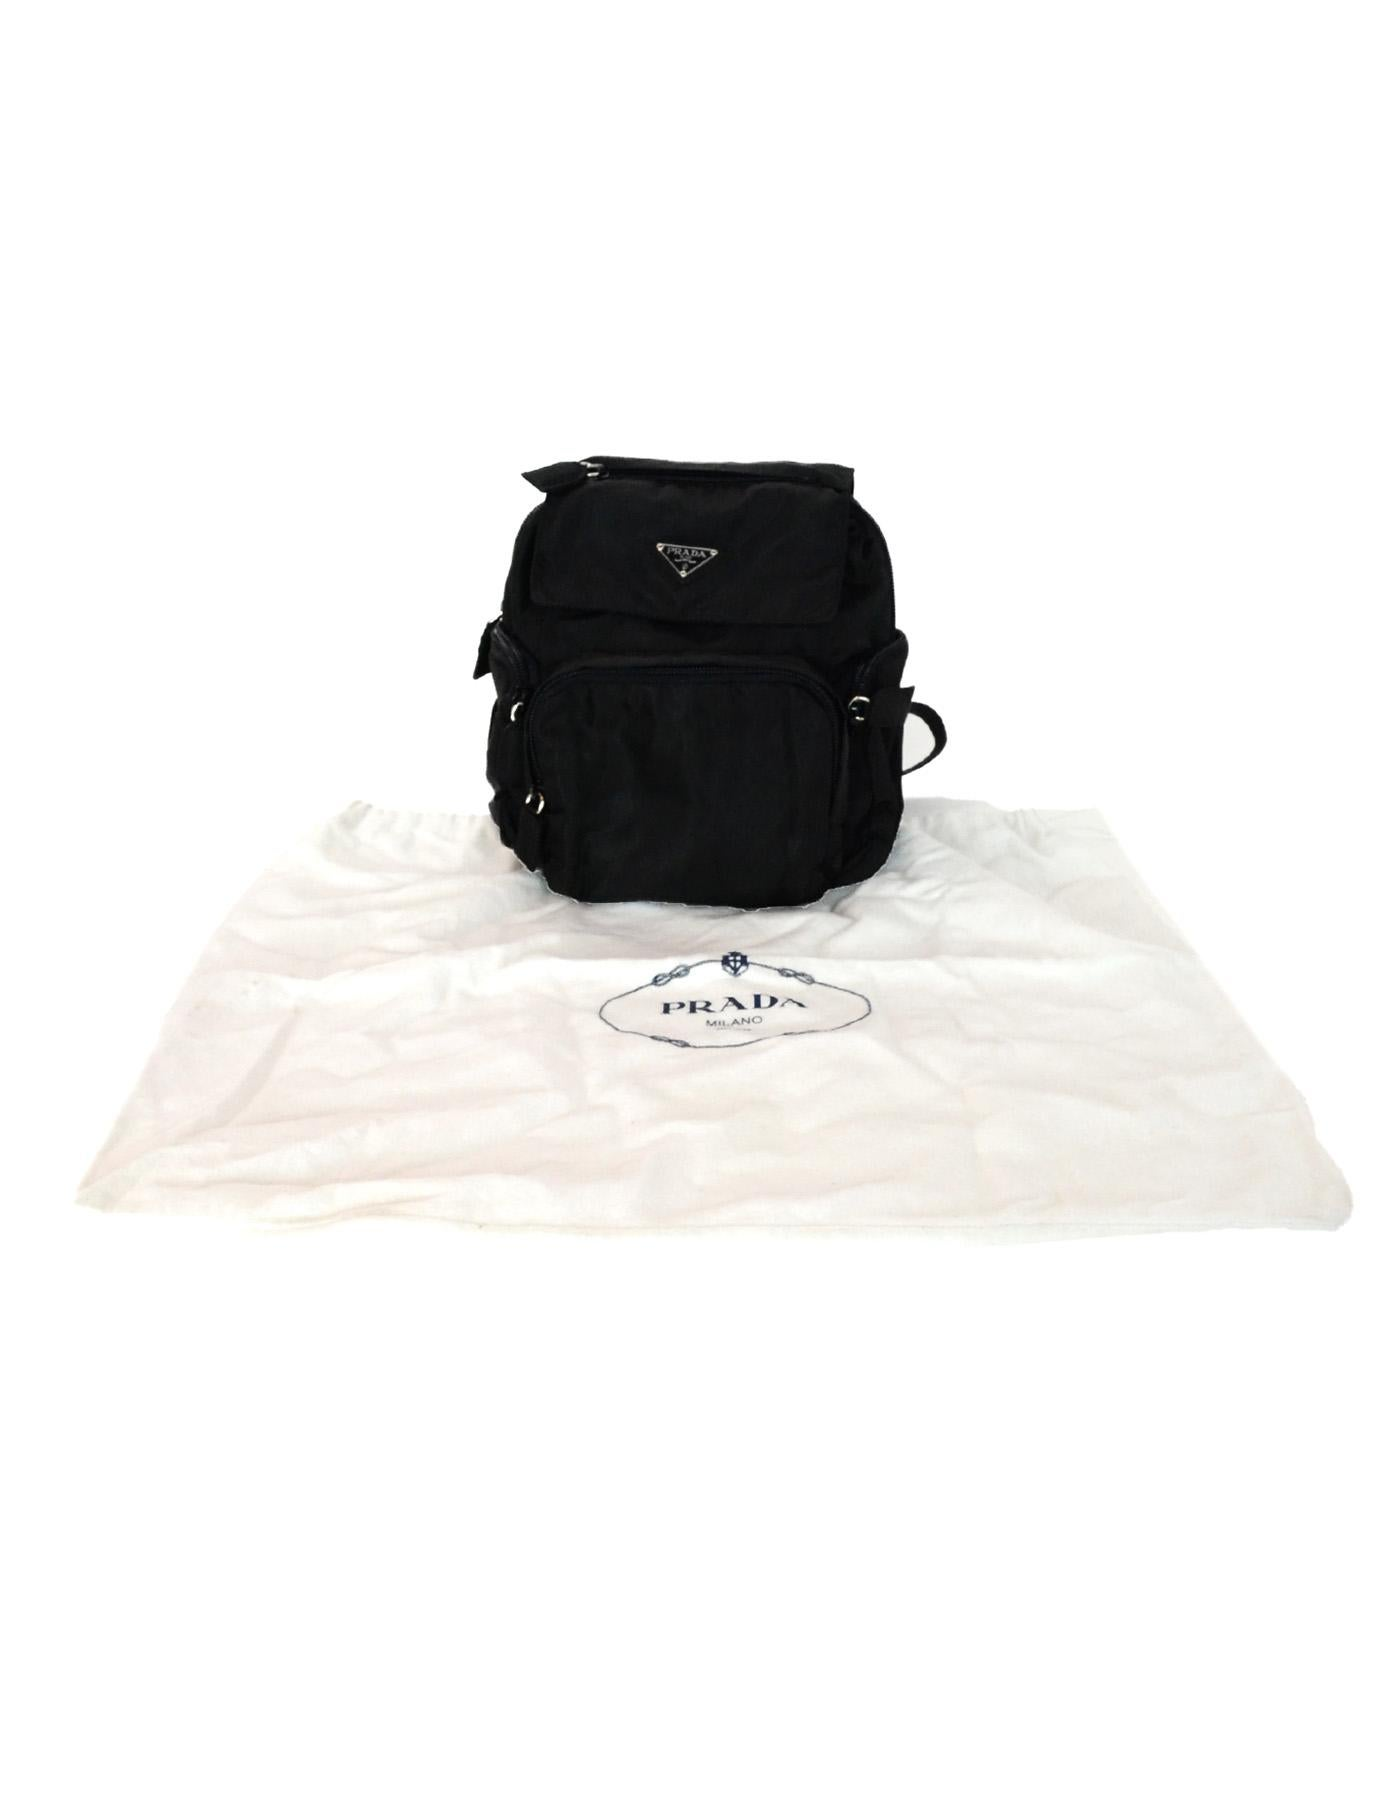 99716fcb3716 ... wholesale prada black nylon mini backpack bag w zip pockets for sale 5  47e8d 36ed1